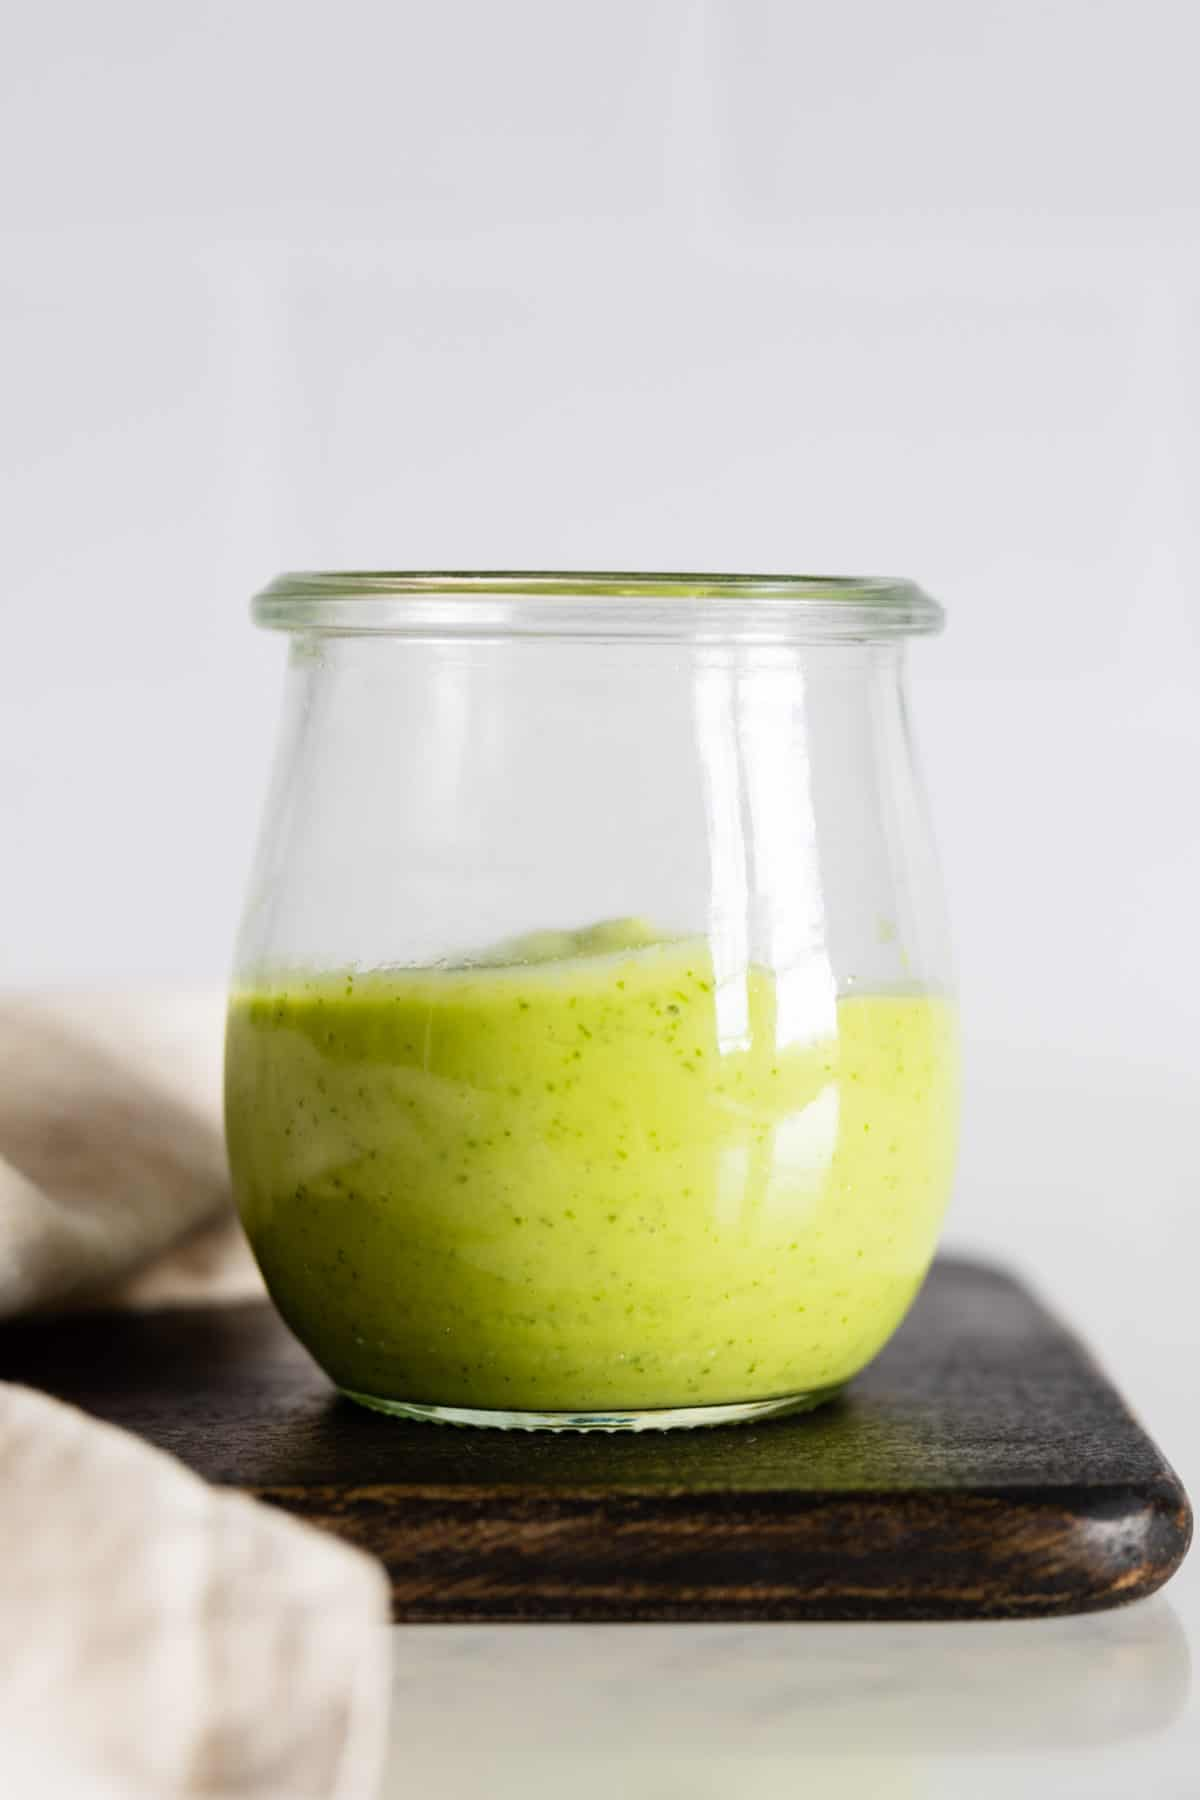 Cilantro Lime Avocado Dressing in a glass jar.